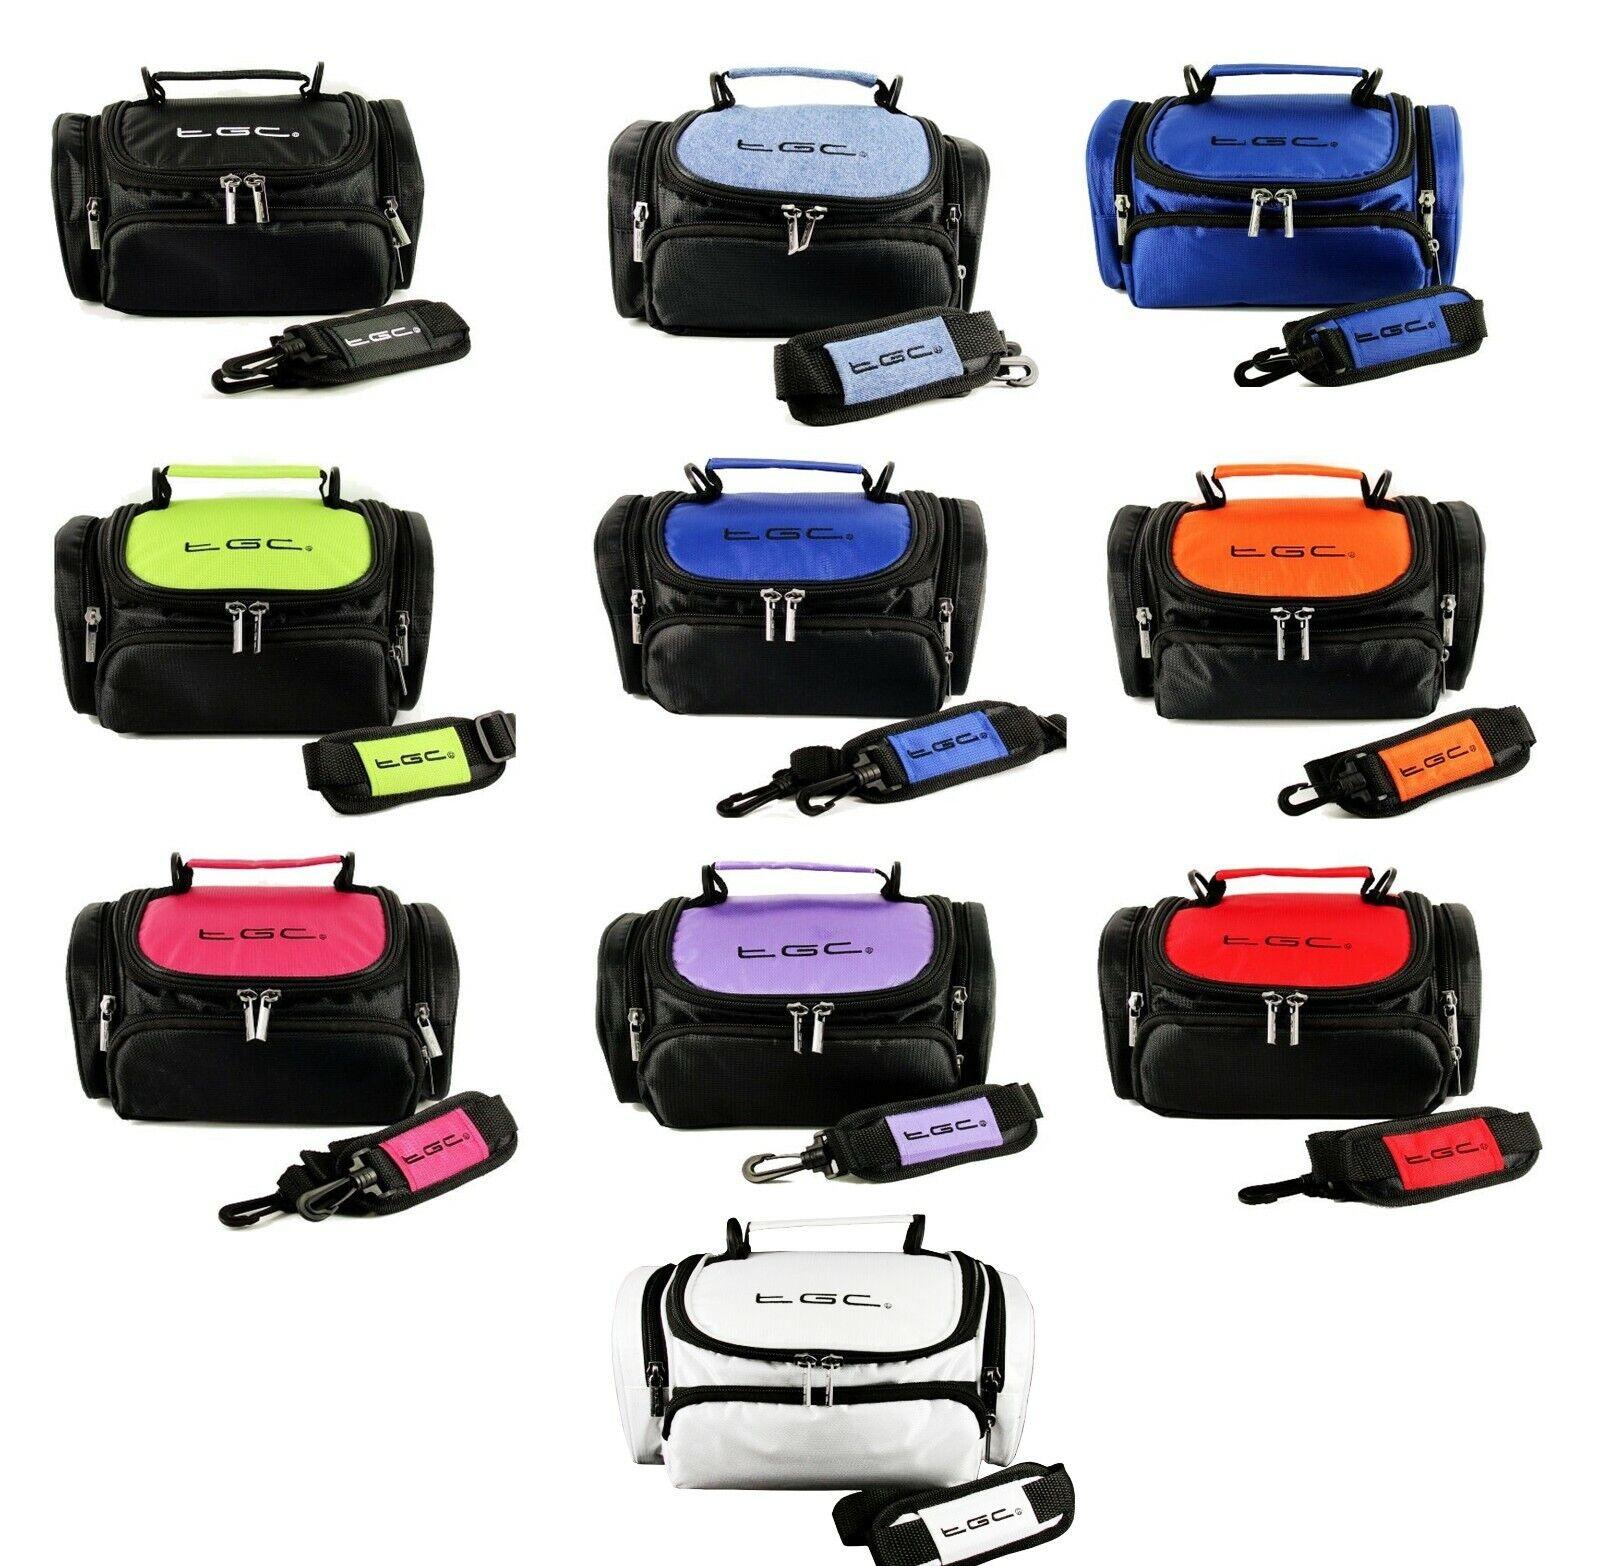 Sony Alpha DSLR-A330 Camera Shoulder Case Bag by TGC ®